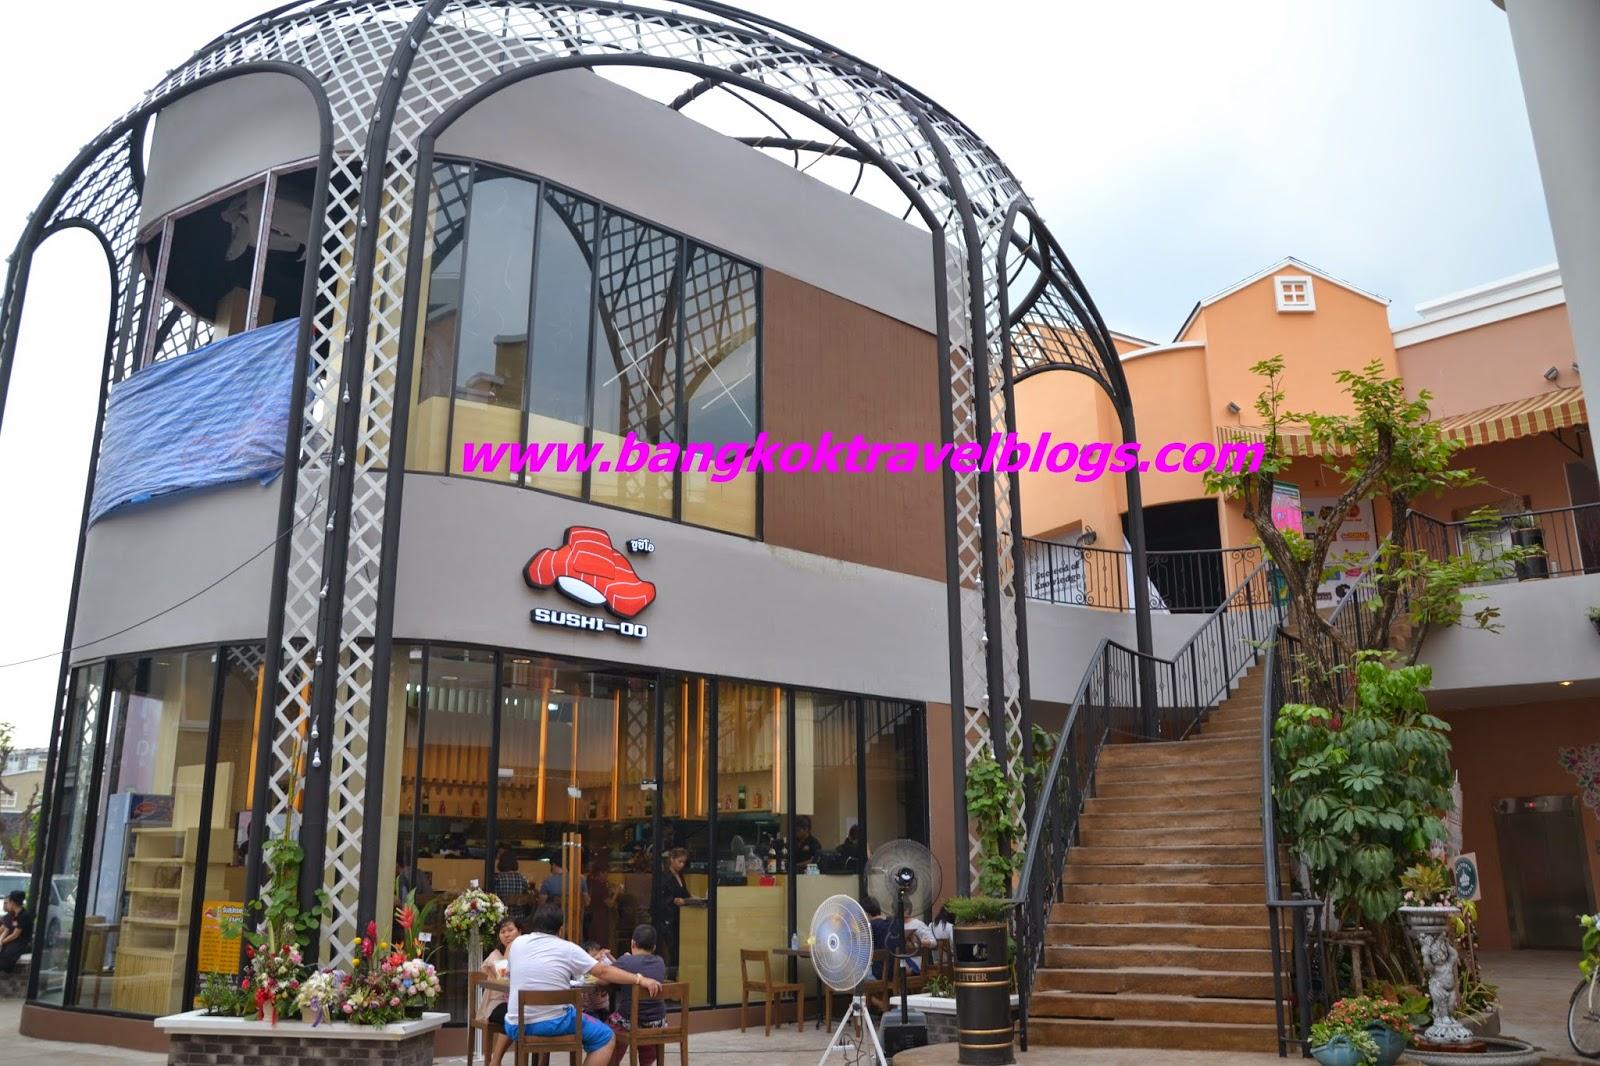 Victoria Gardens Outdoor Mall